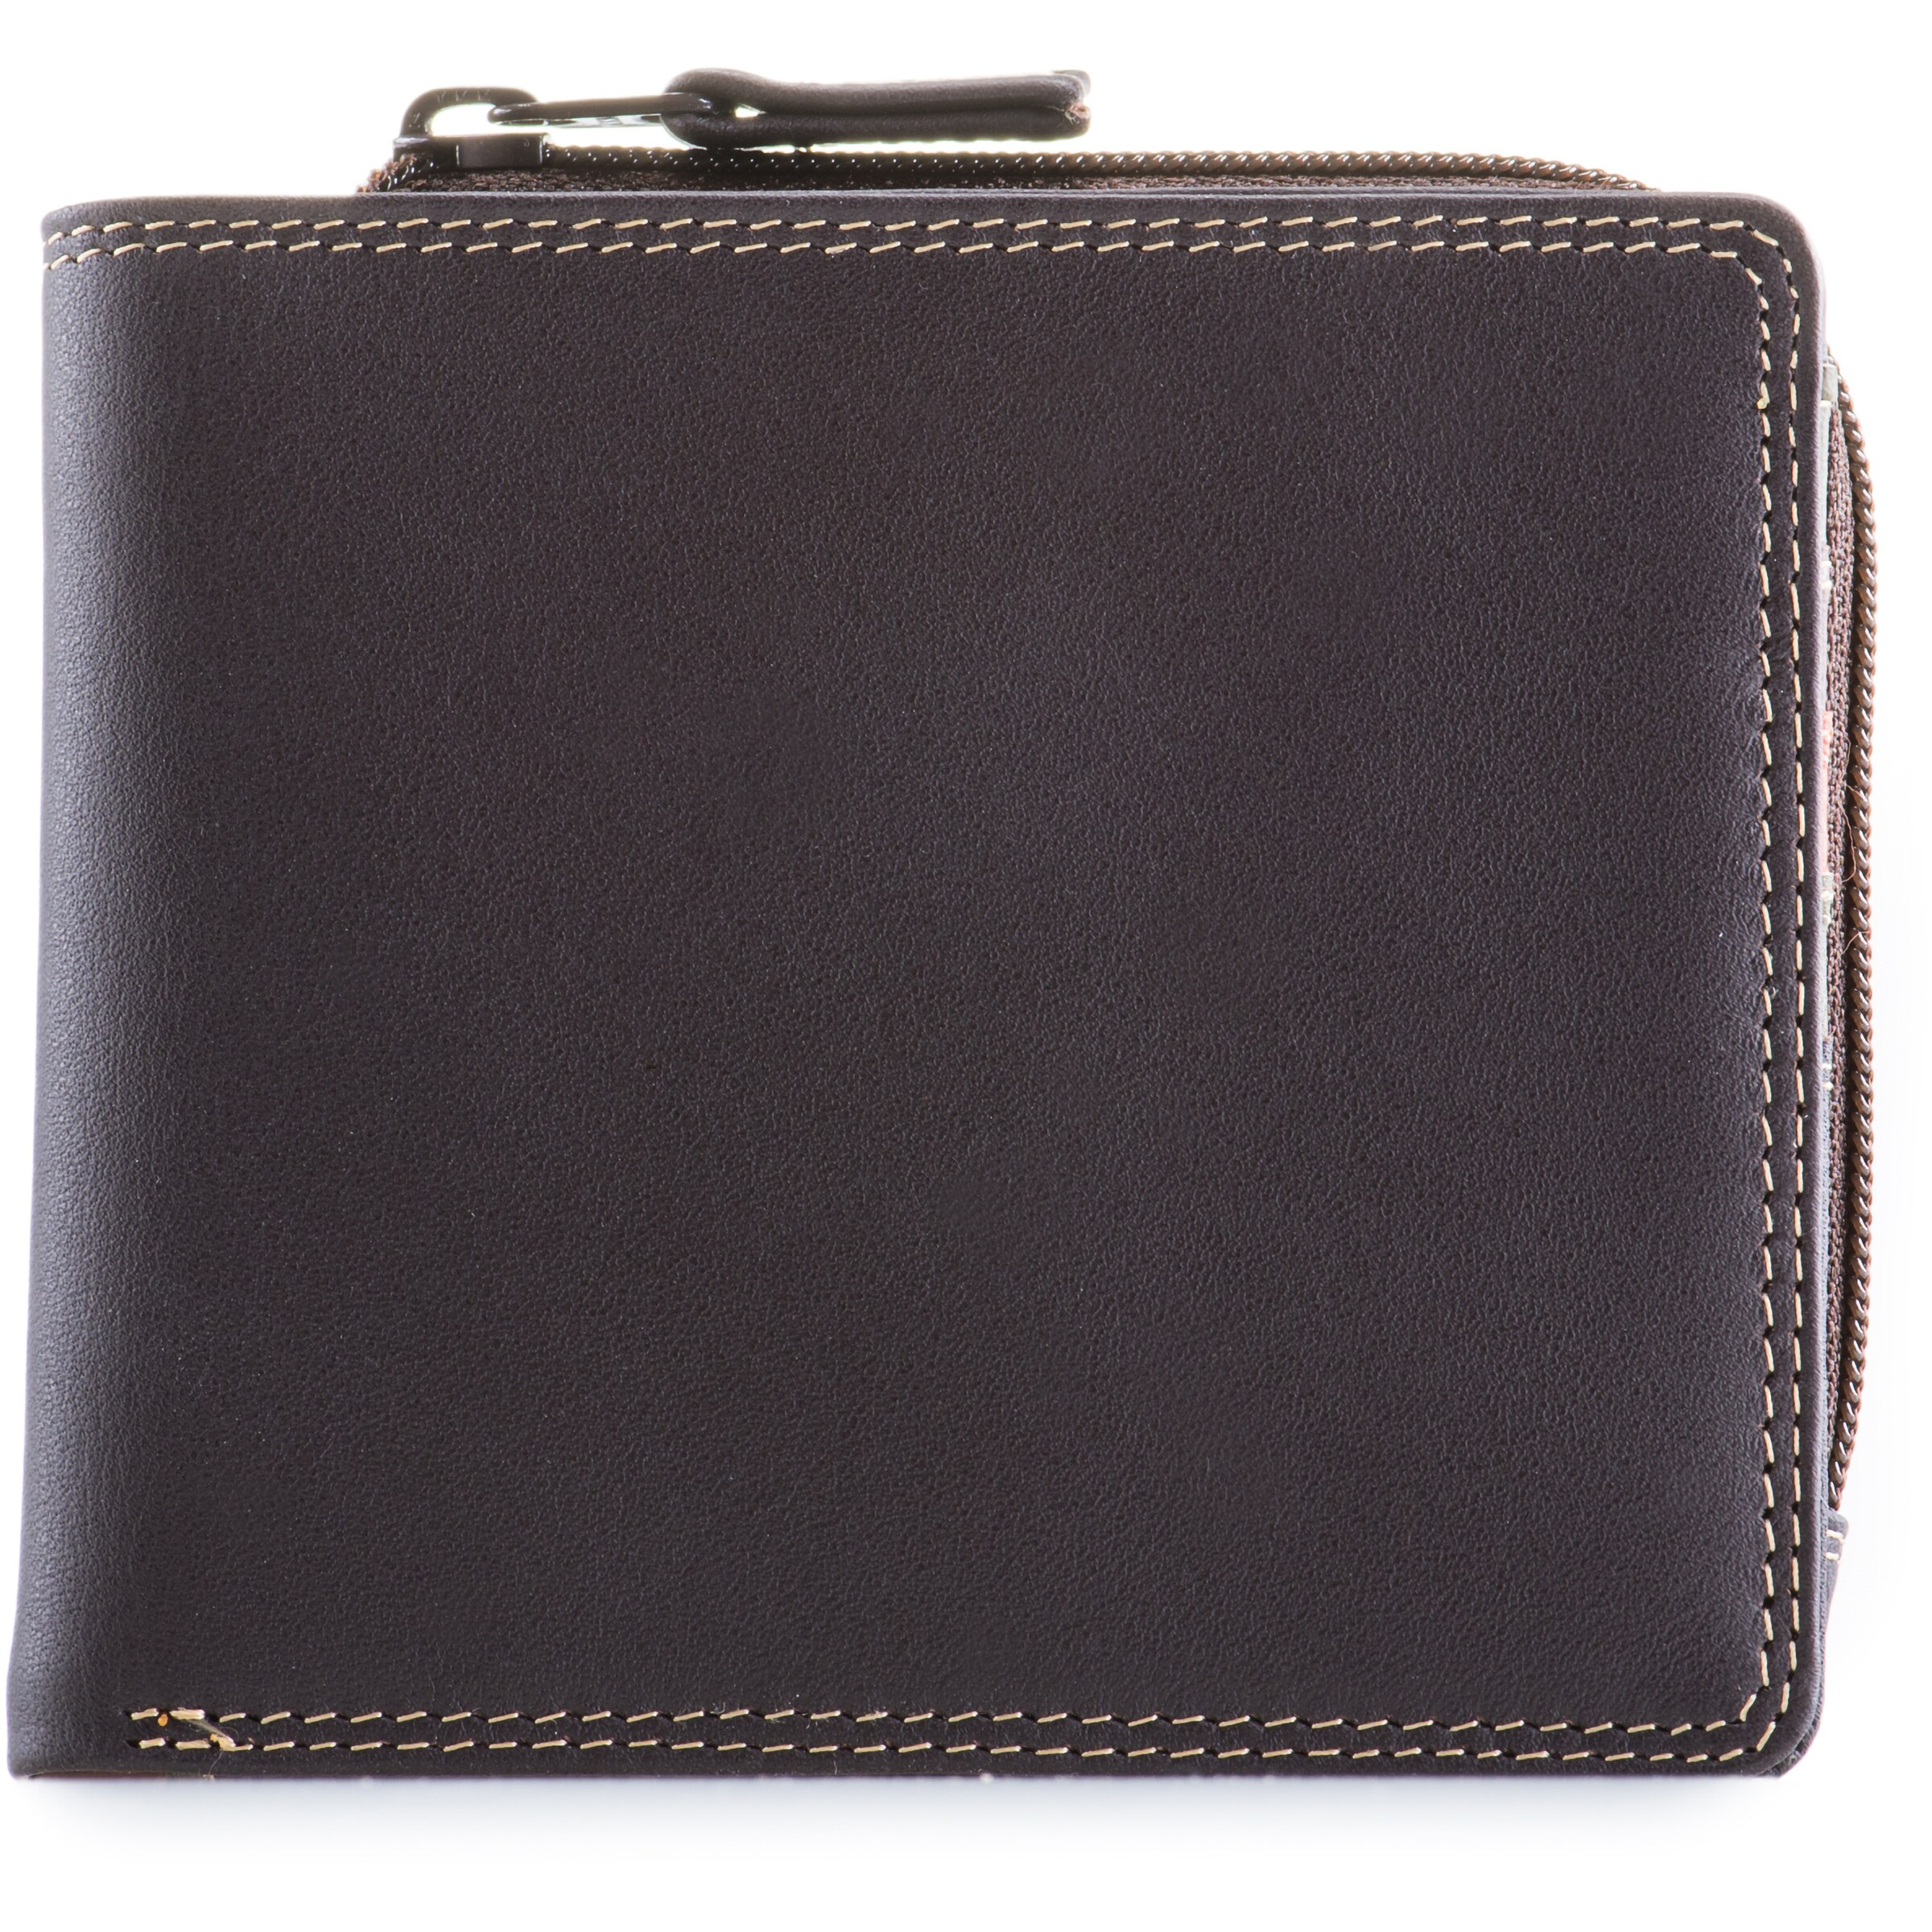 Geldbörse 'standard In Braun Mywalit Wallet' 7YbfvmI6gy